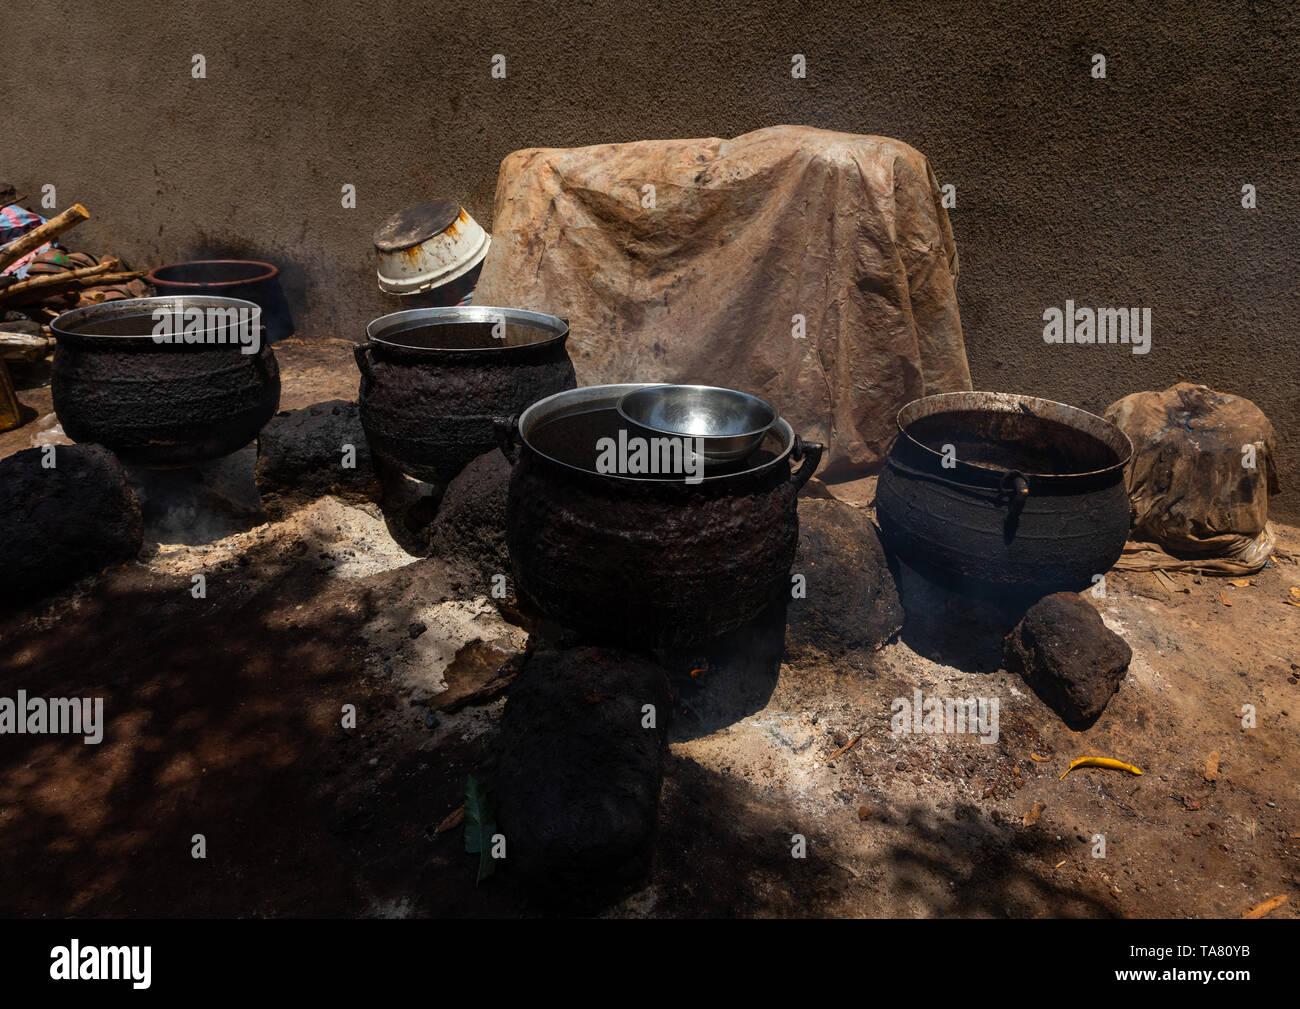 Shea butter or karite factory, Savanes district, Tcheregnimin, Ivory Coast - Stock Image